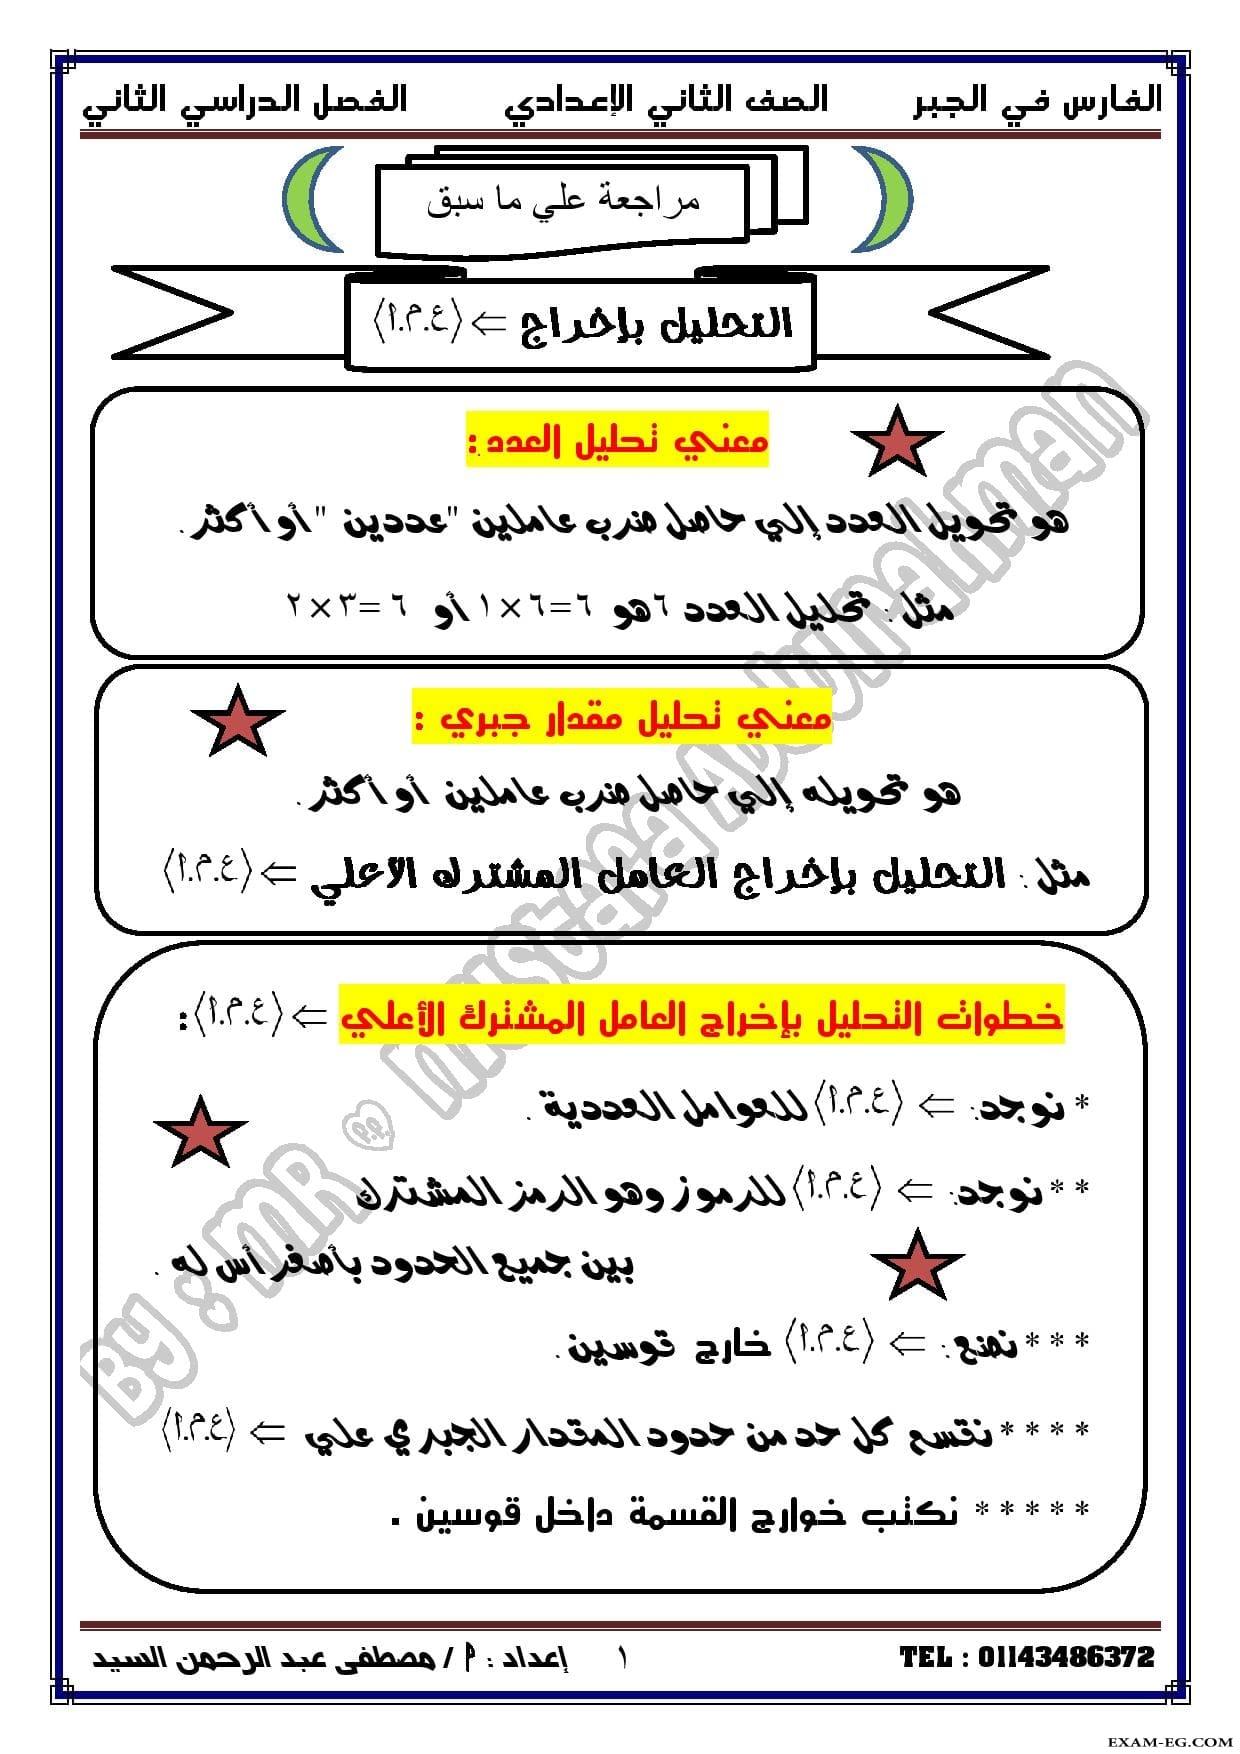 exam-eg.com_151699284954451.jpg